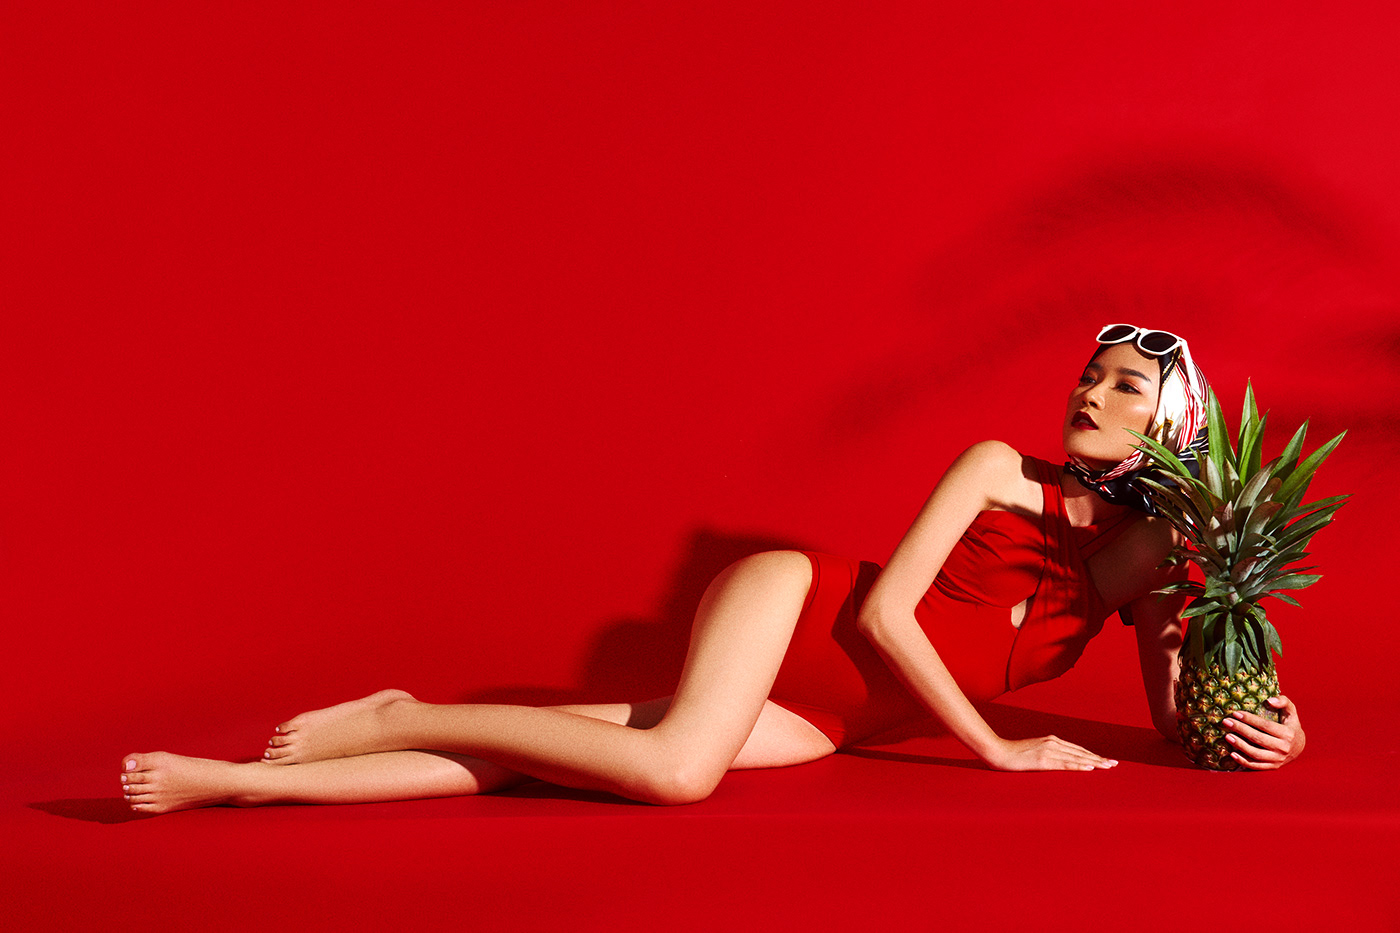 It's Summer Time (Promo Magazine) / фотограф Truong Nguyen